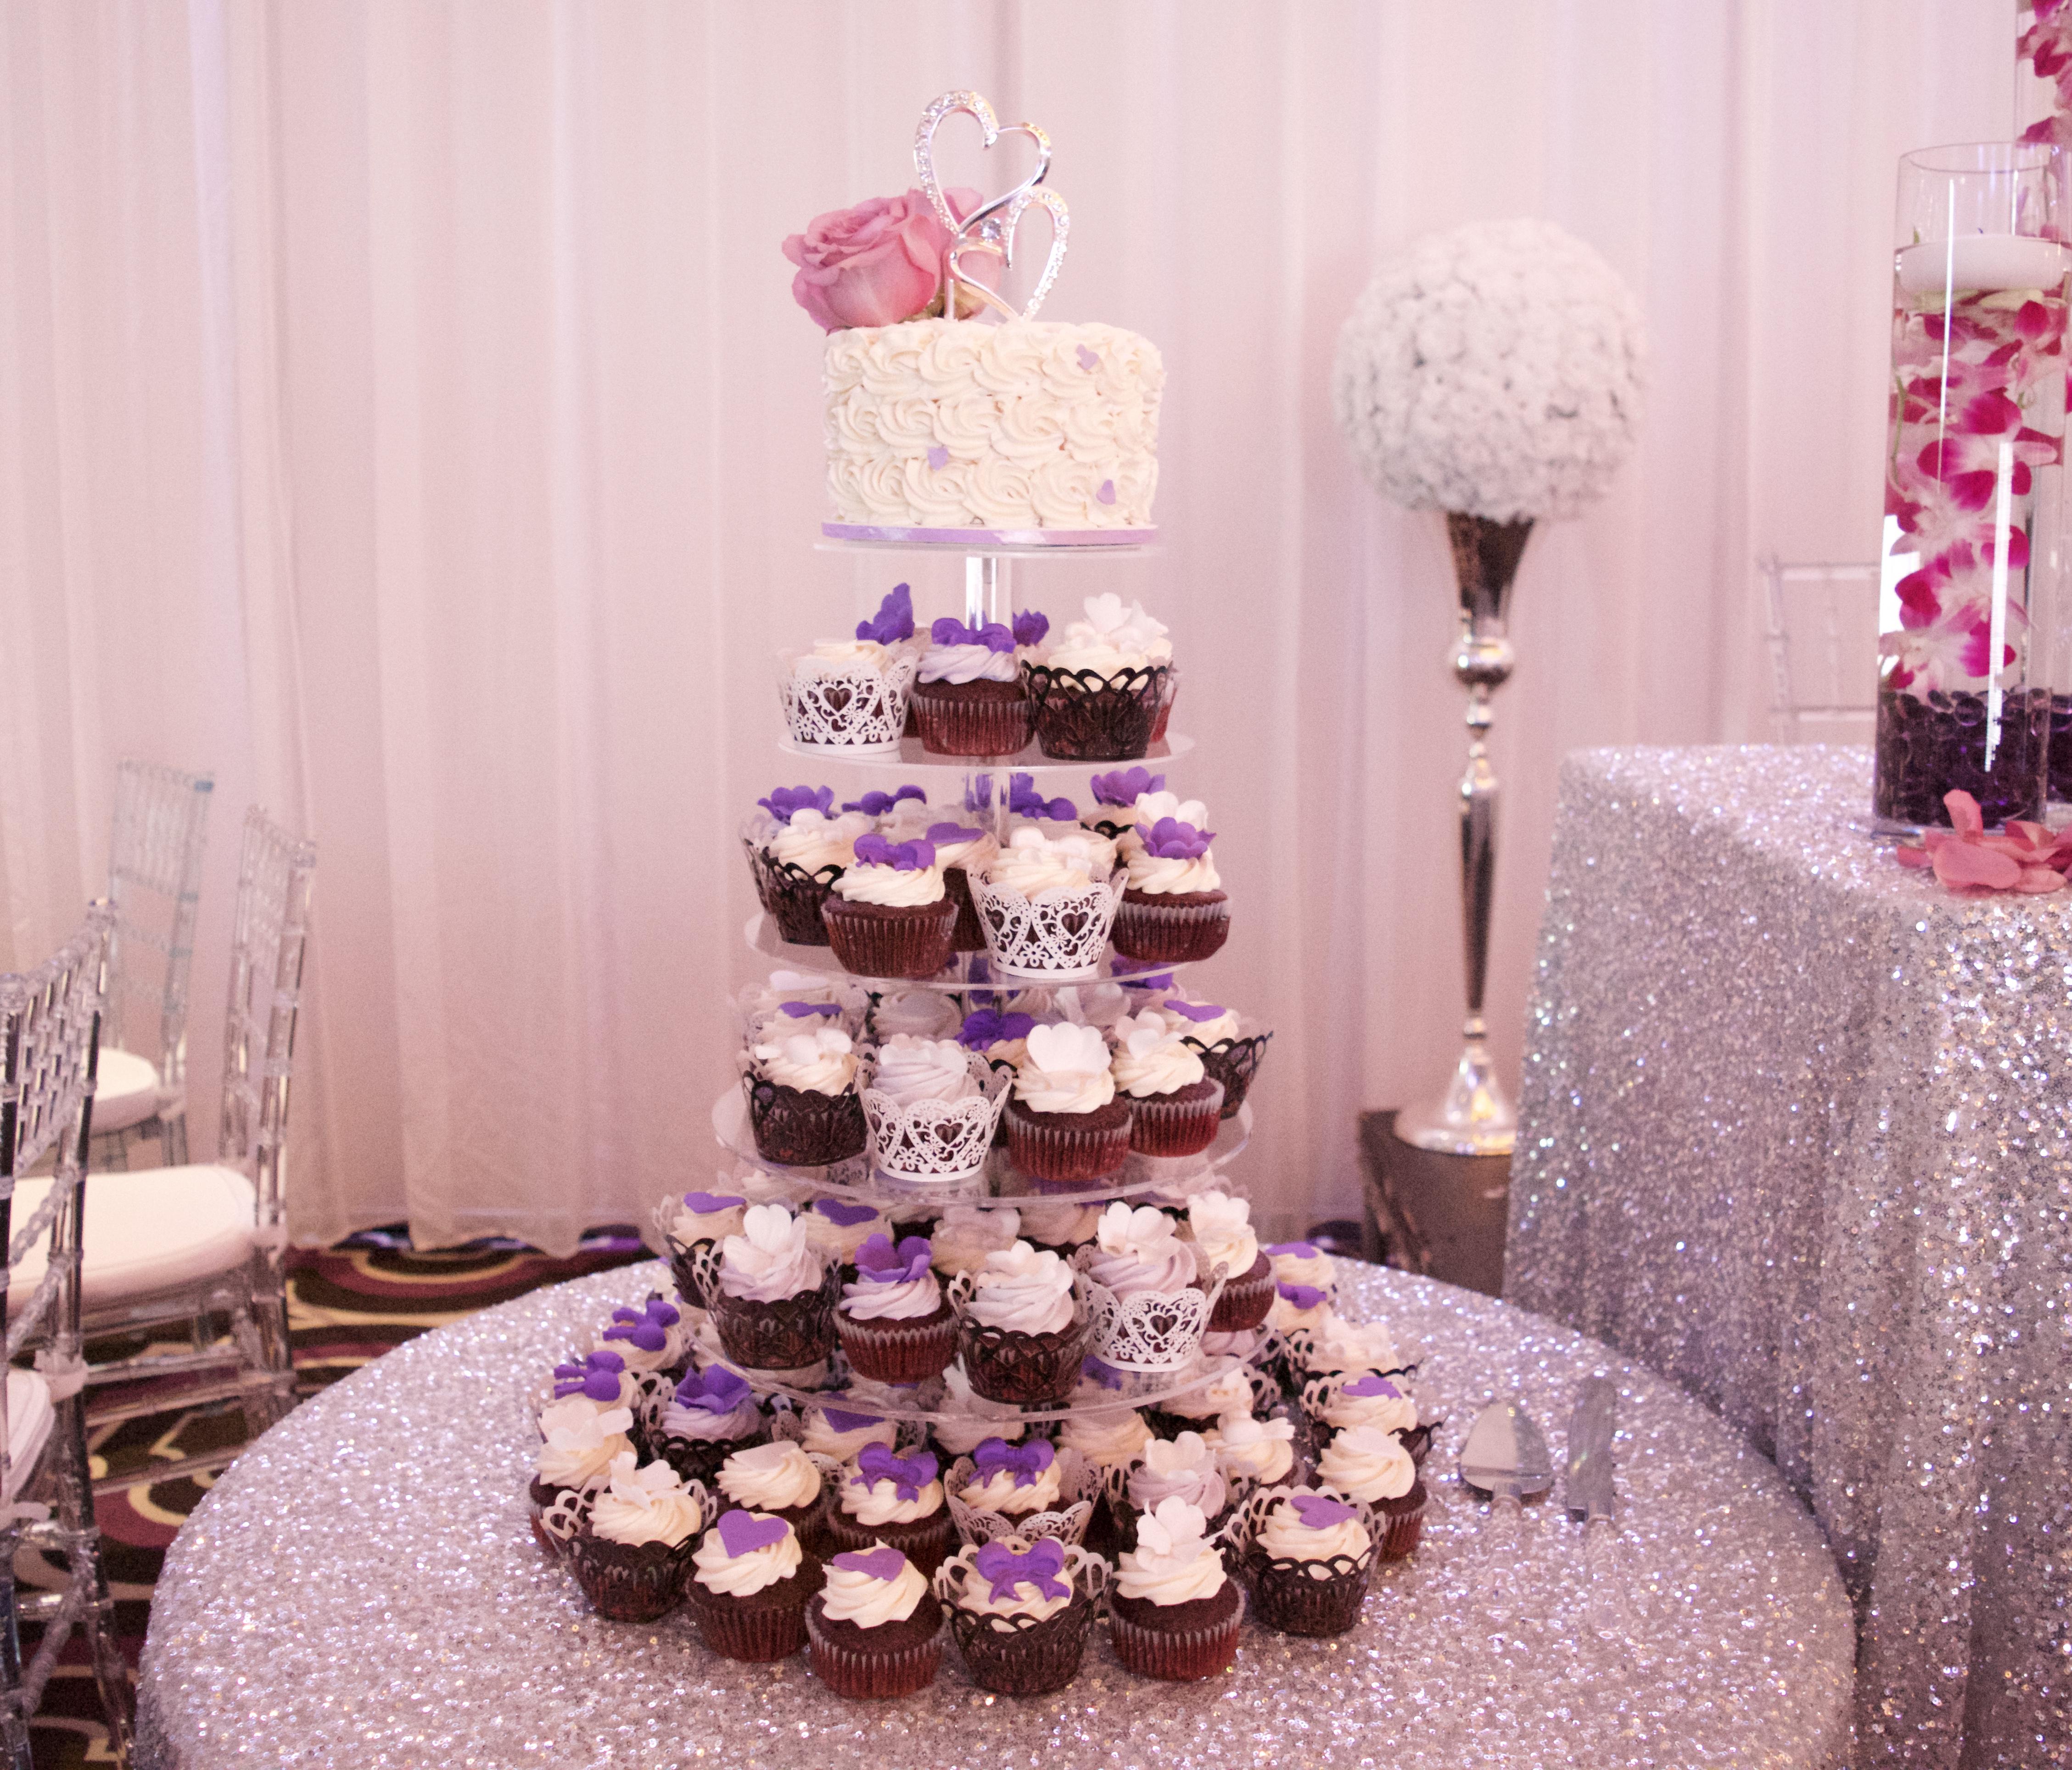 Toure à cupcakes